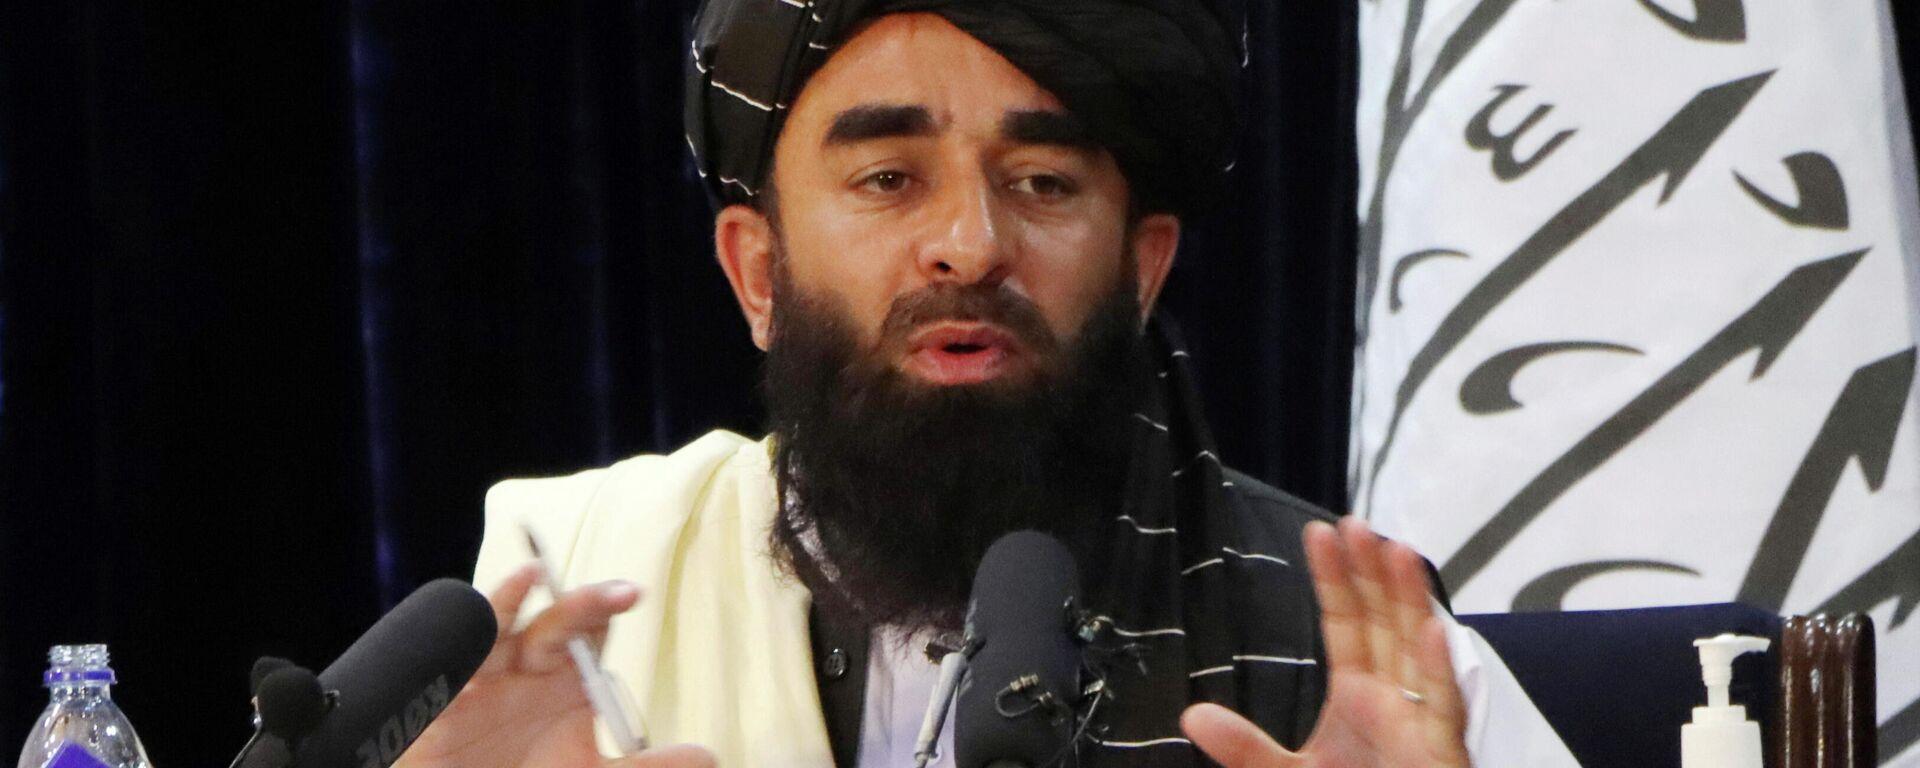 Zabihullah Mujahid, portavoz del movimiento radical talibán (proscrito en Rusia) - Sputnik Mundo, 1920, 18.08.2021